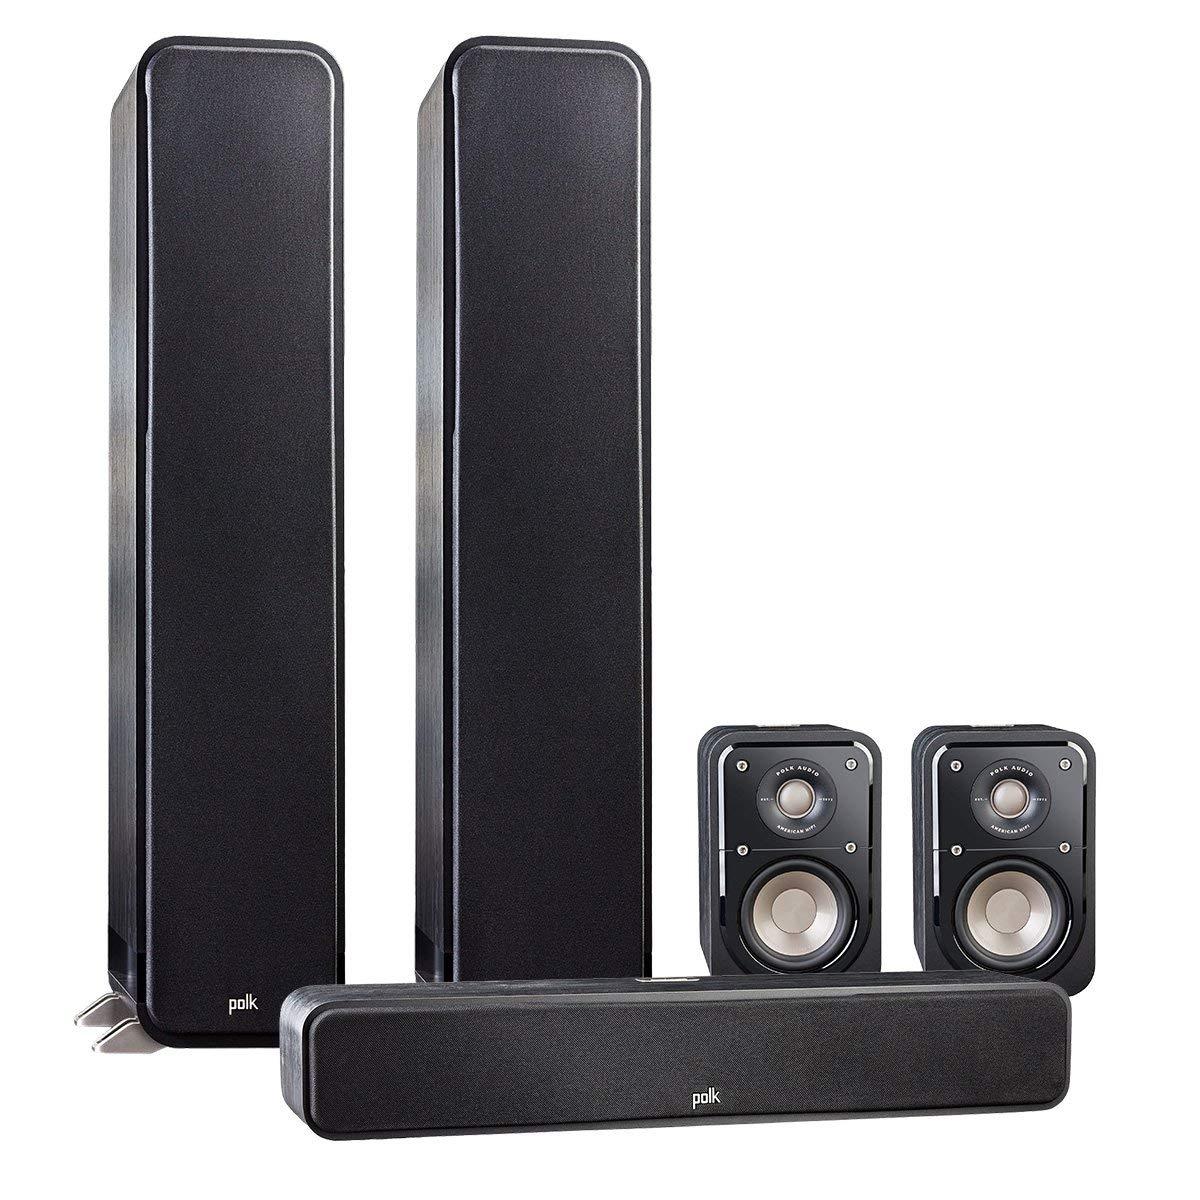 Polk Audio 5.0 Signature Series S60 Home Theater Package with S20 Bookshelf Speakers and S35 Slim Center Speaker (Black)